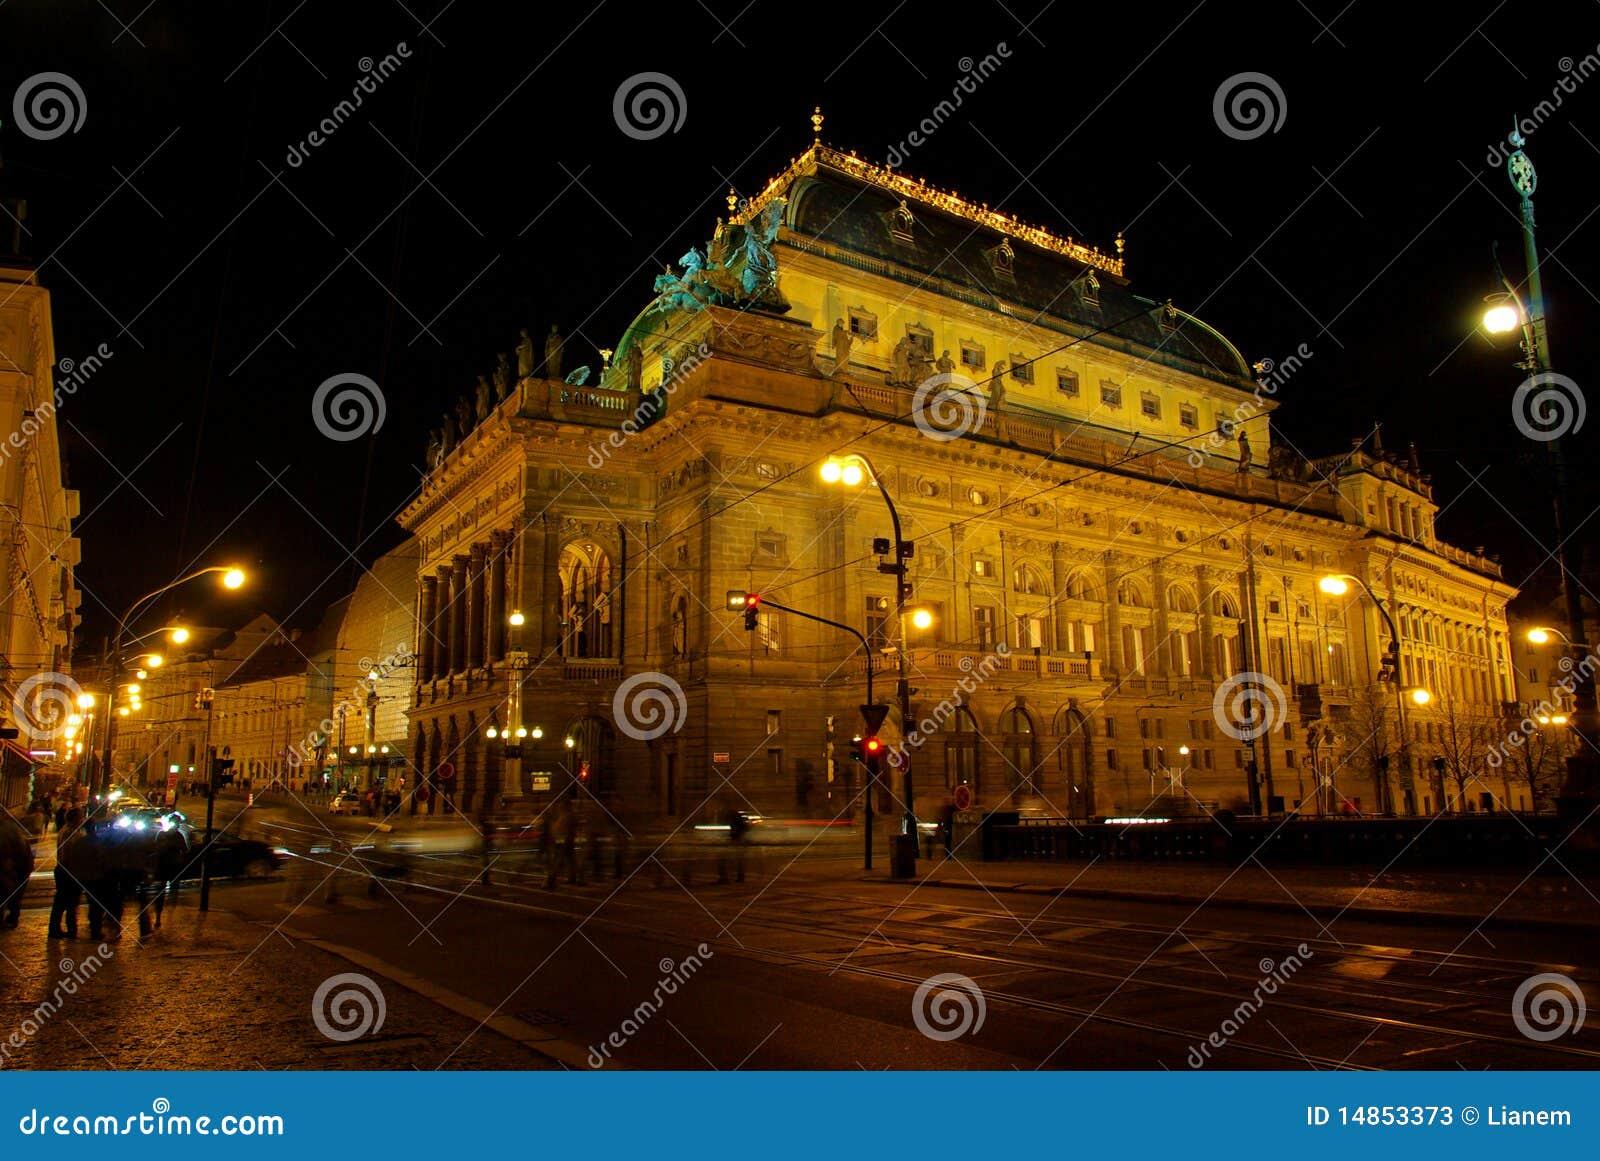 Prague national theatre night